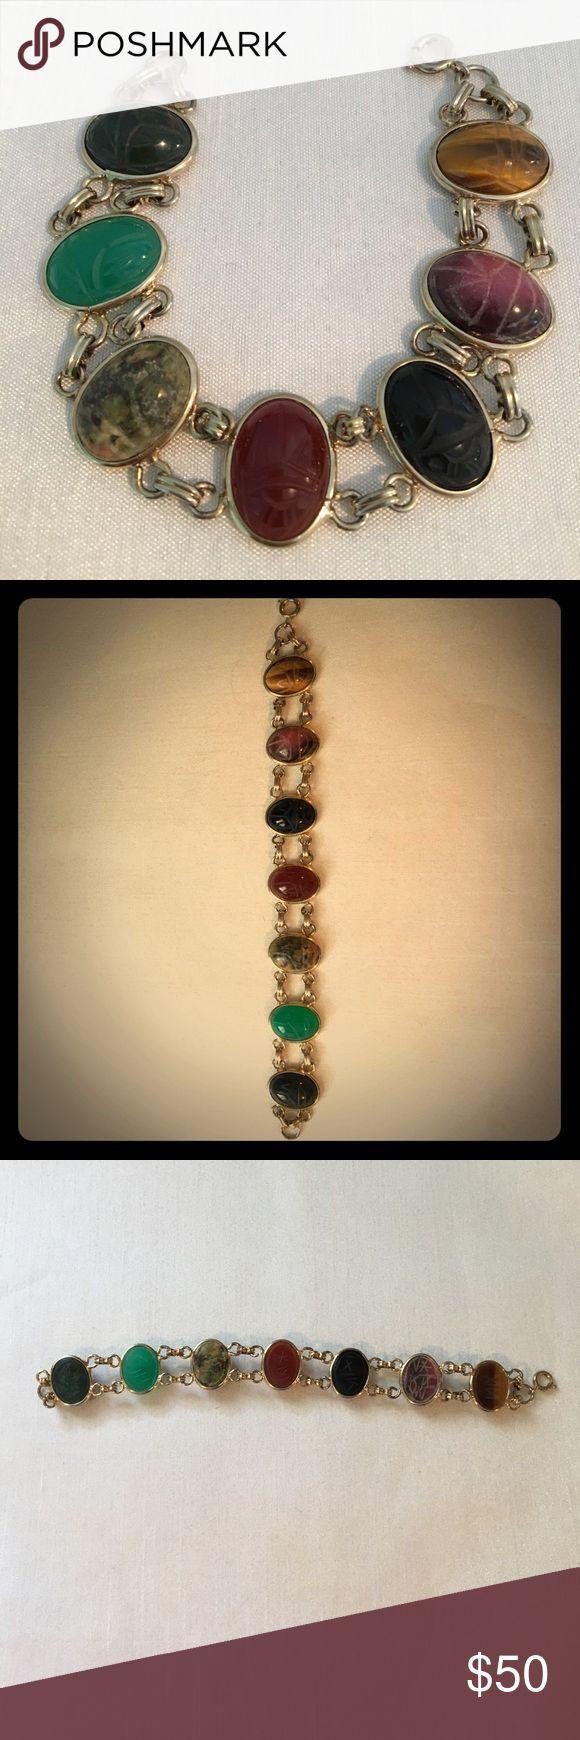 Vintage scarab bracelet Antique htf vintage piece Jewelry Bracelets